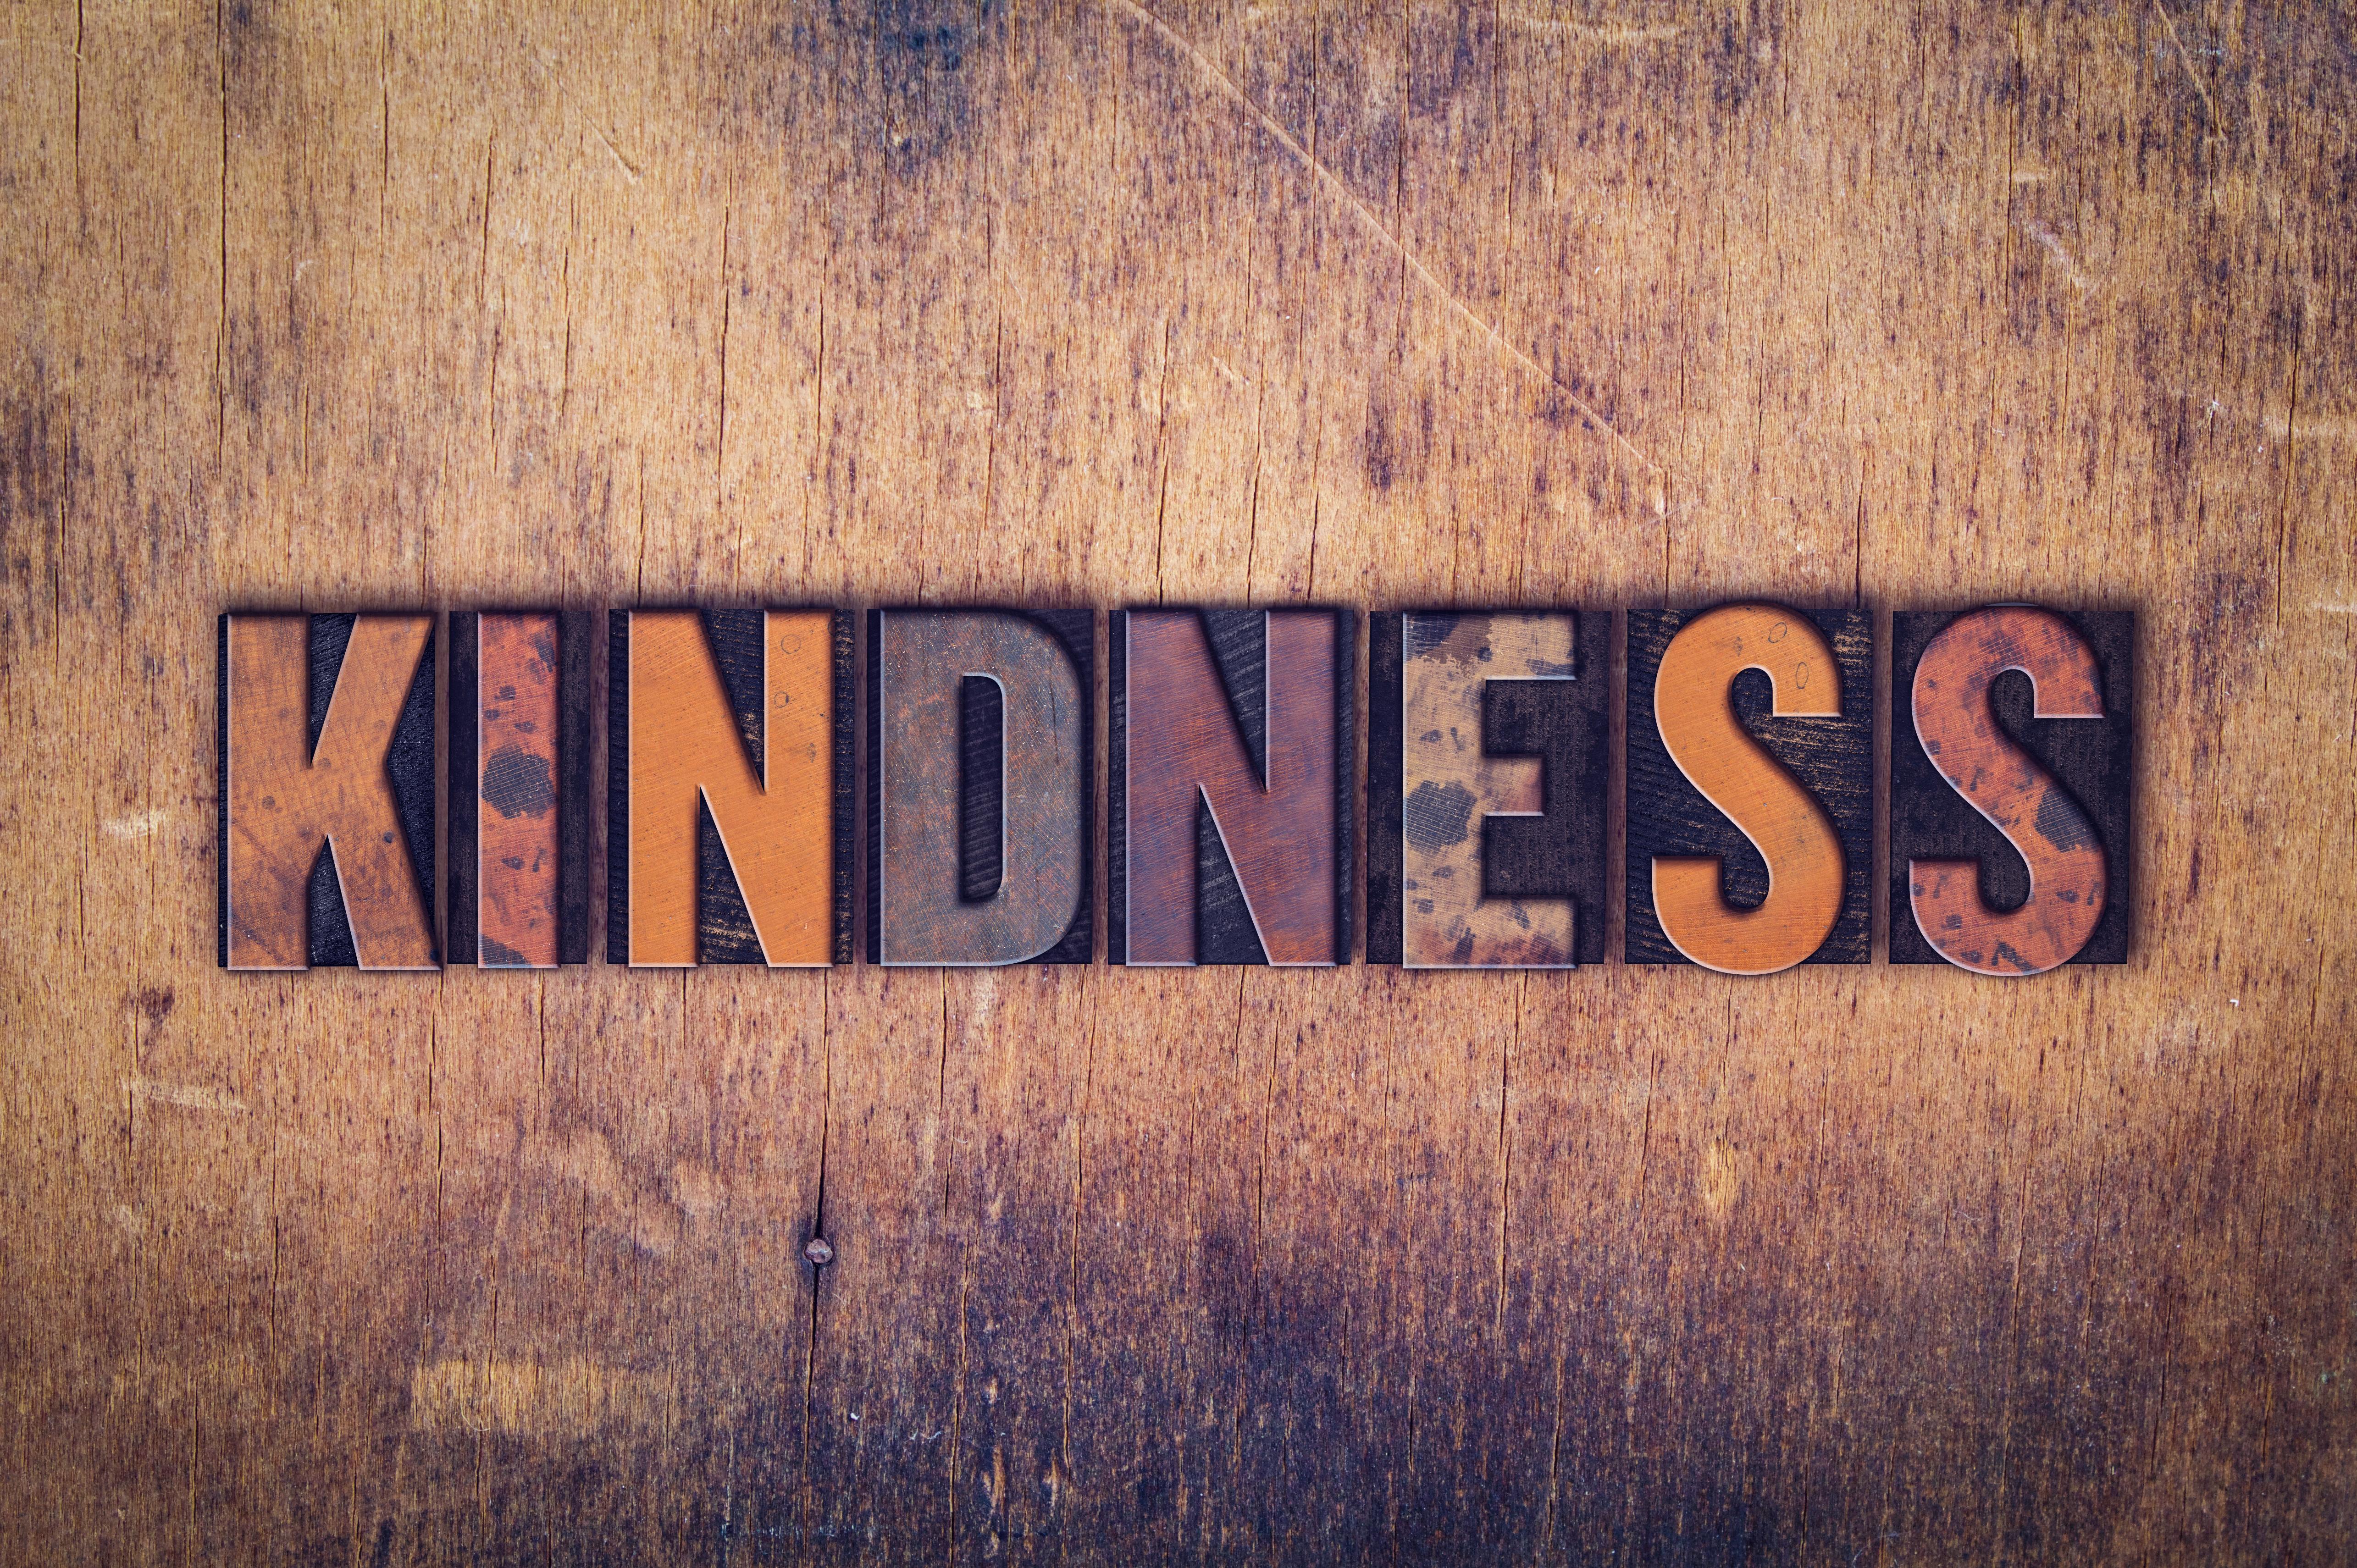 Sami Muirhead says kindness is important